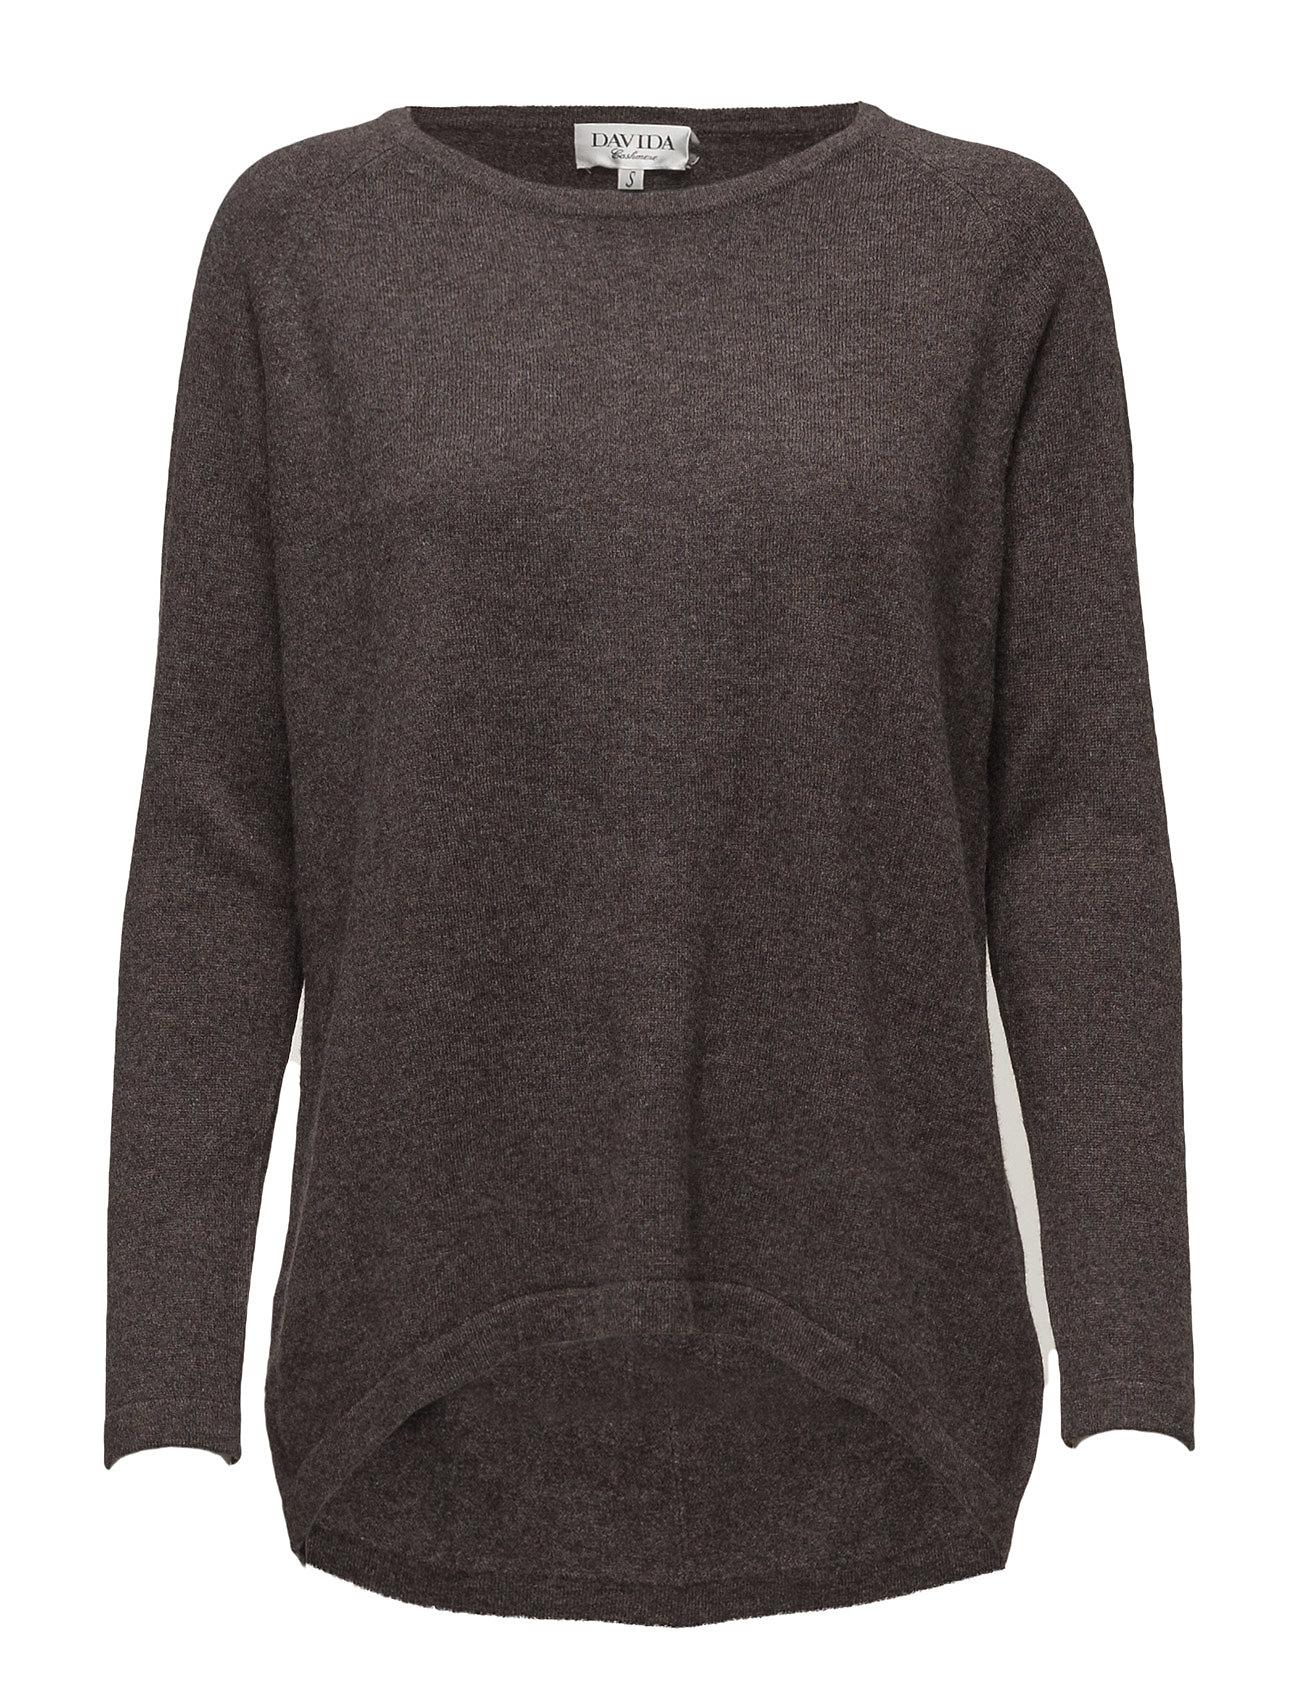 davida cashmere Loose sweater på boozt.com dk